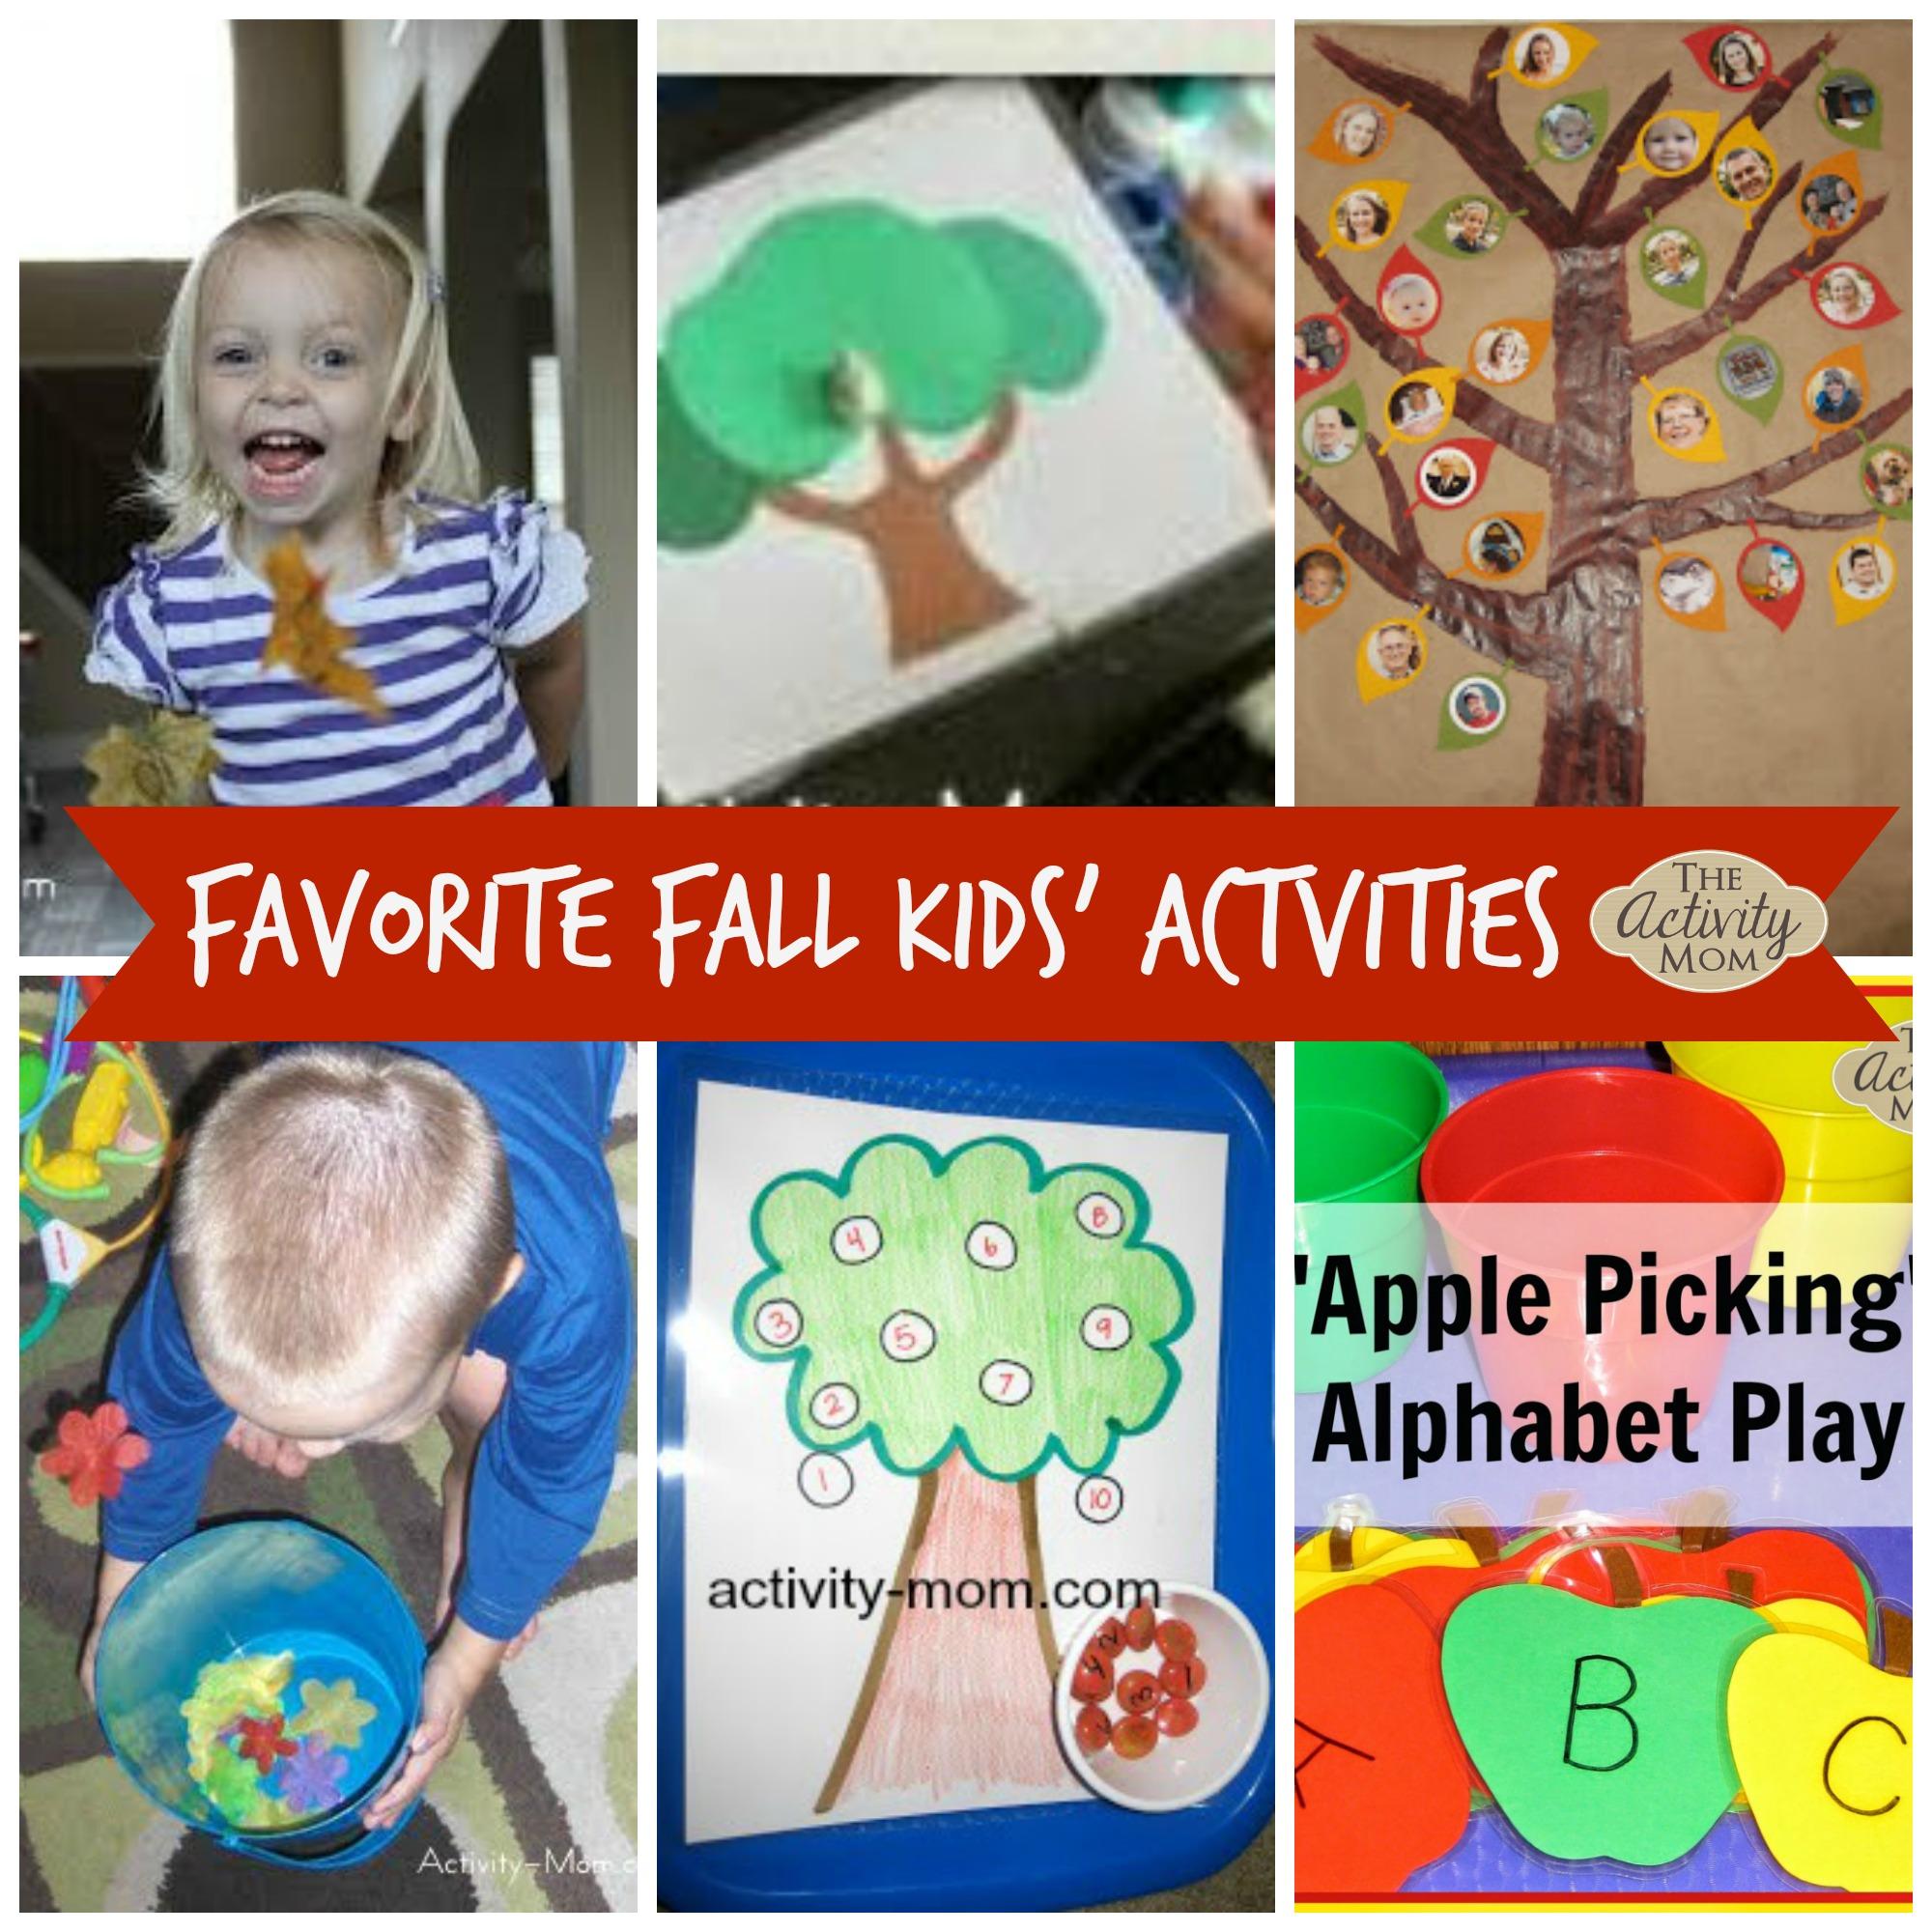 Fall Kids' Activities